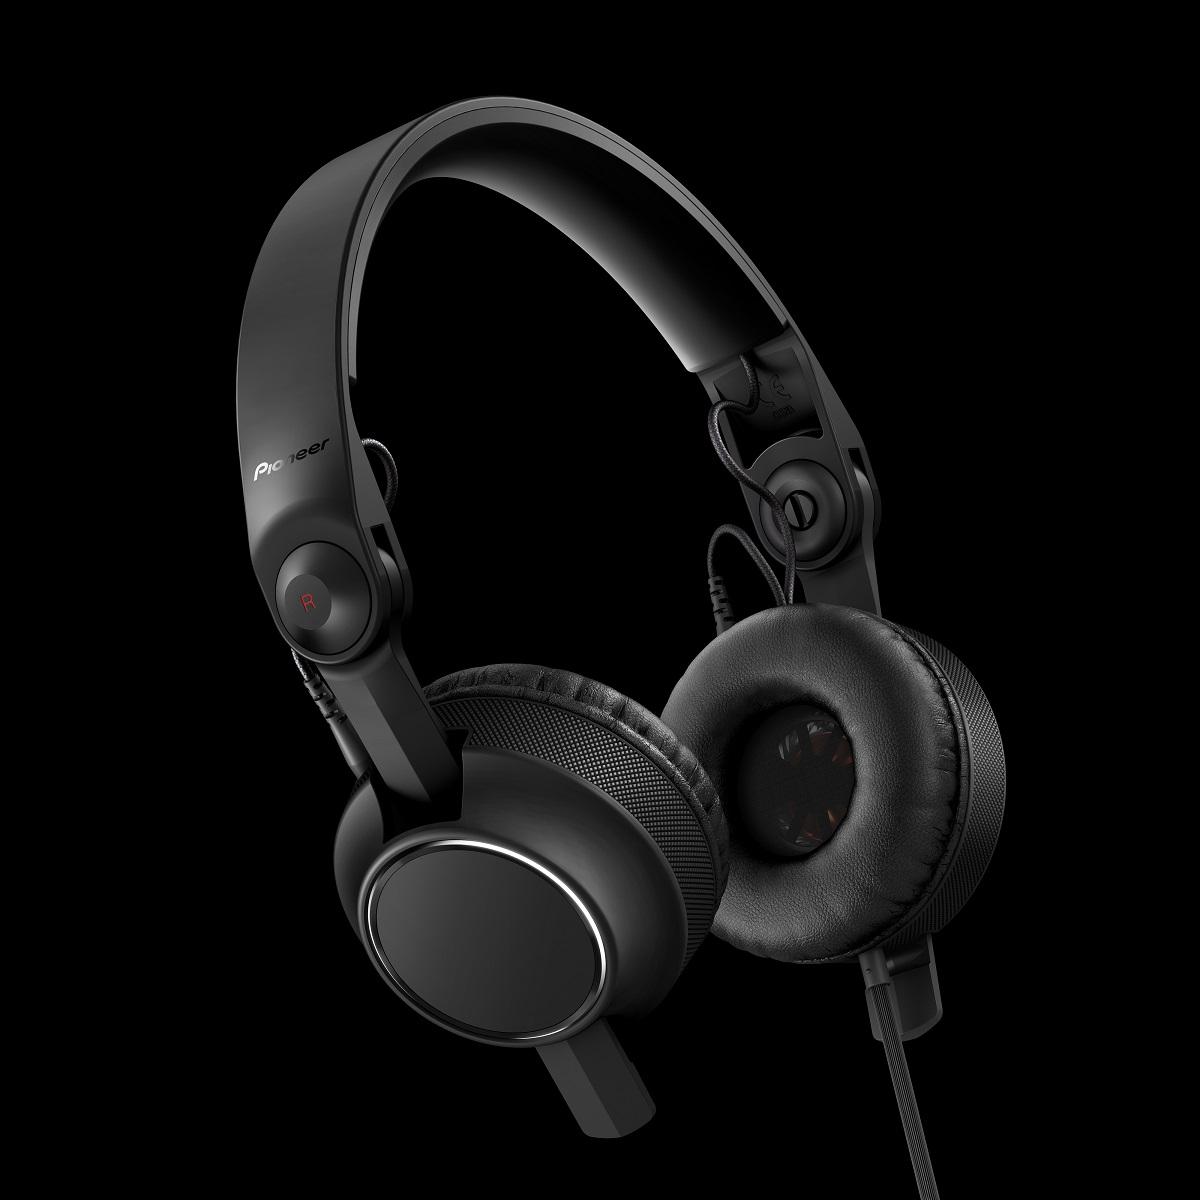 Neu: Pioneer HDJ-C70 Kopfhörer - HD-25 Kopie oder Killer?